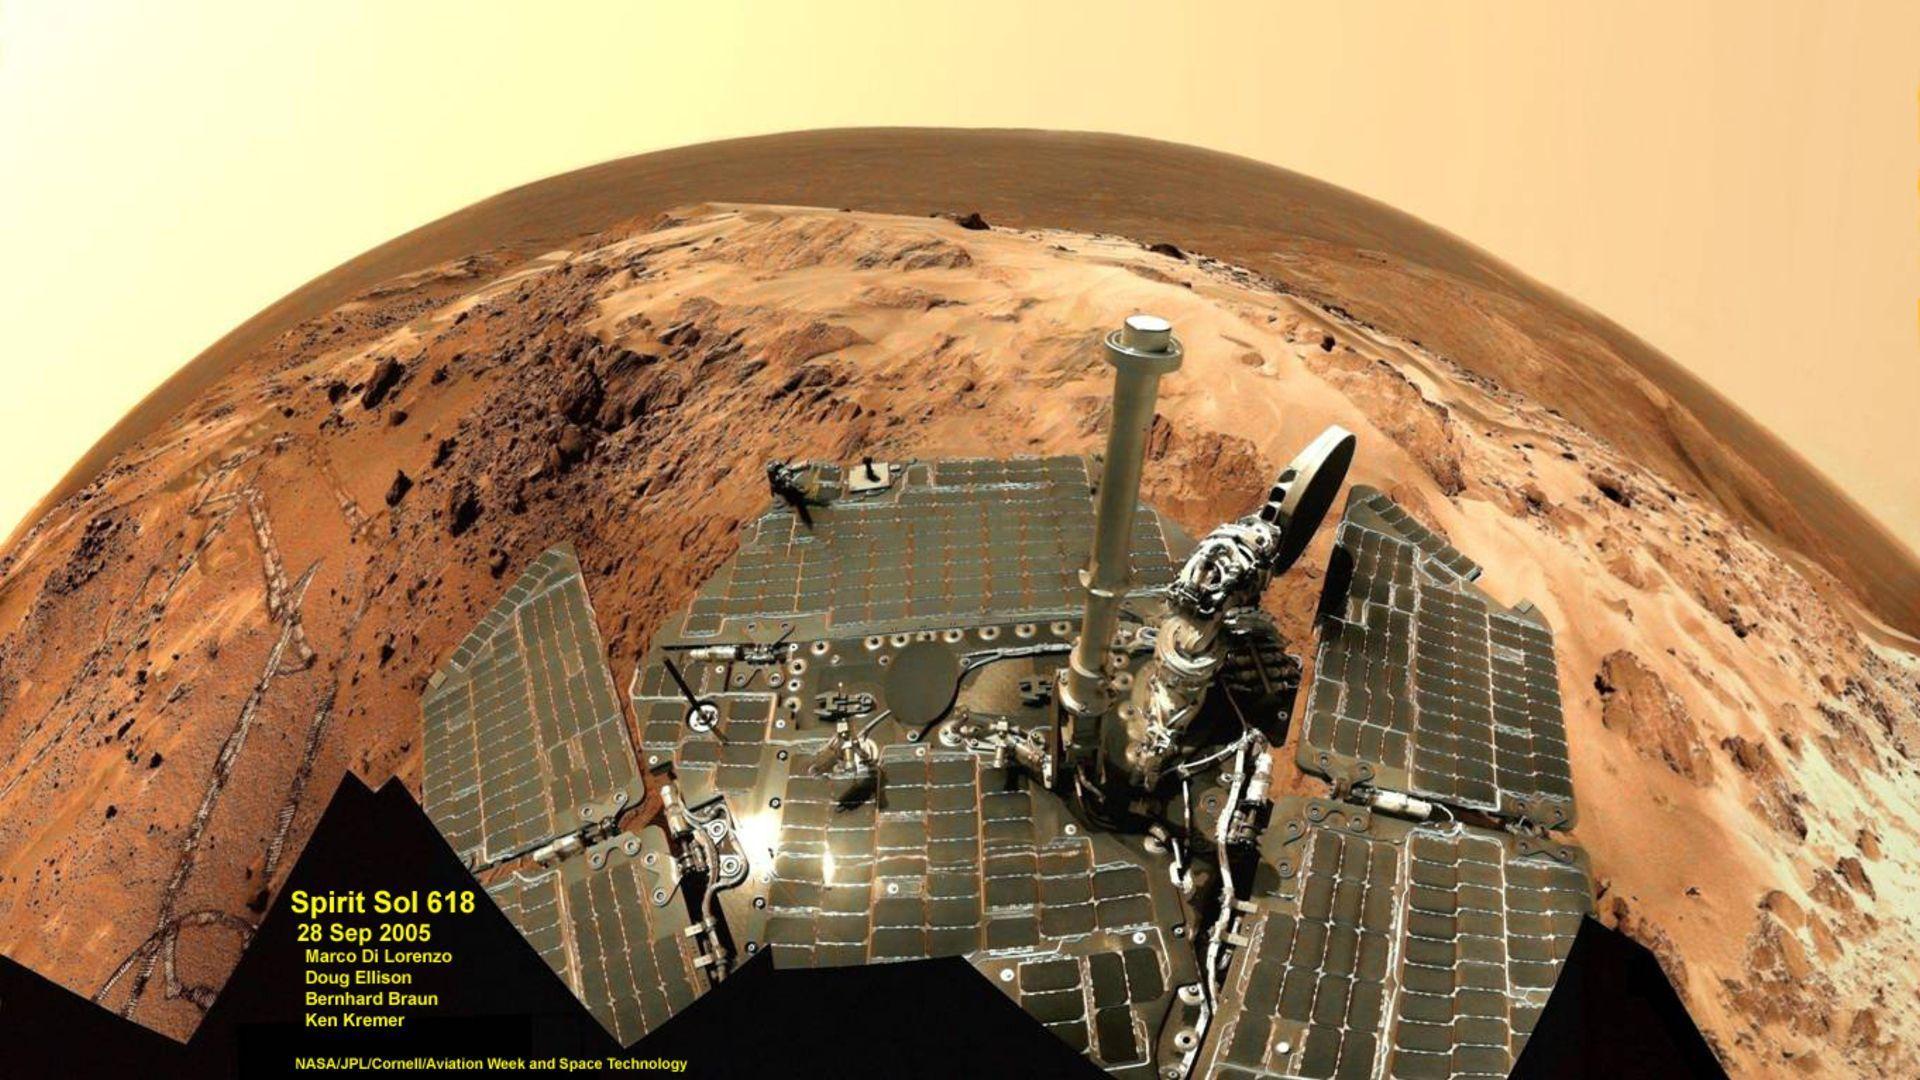 mars rover spirit - HD1920×1080